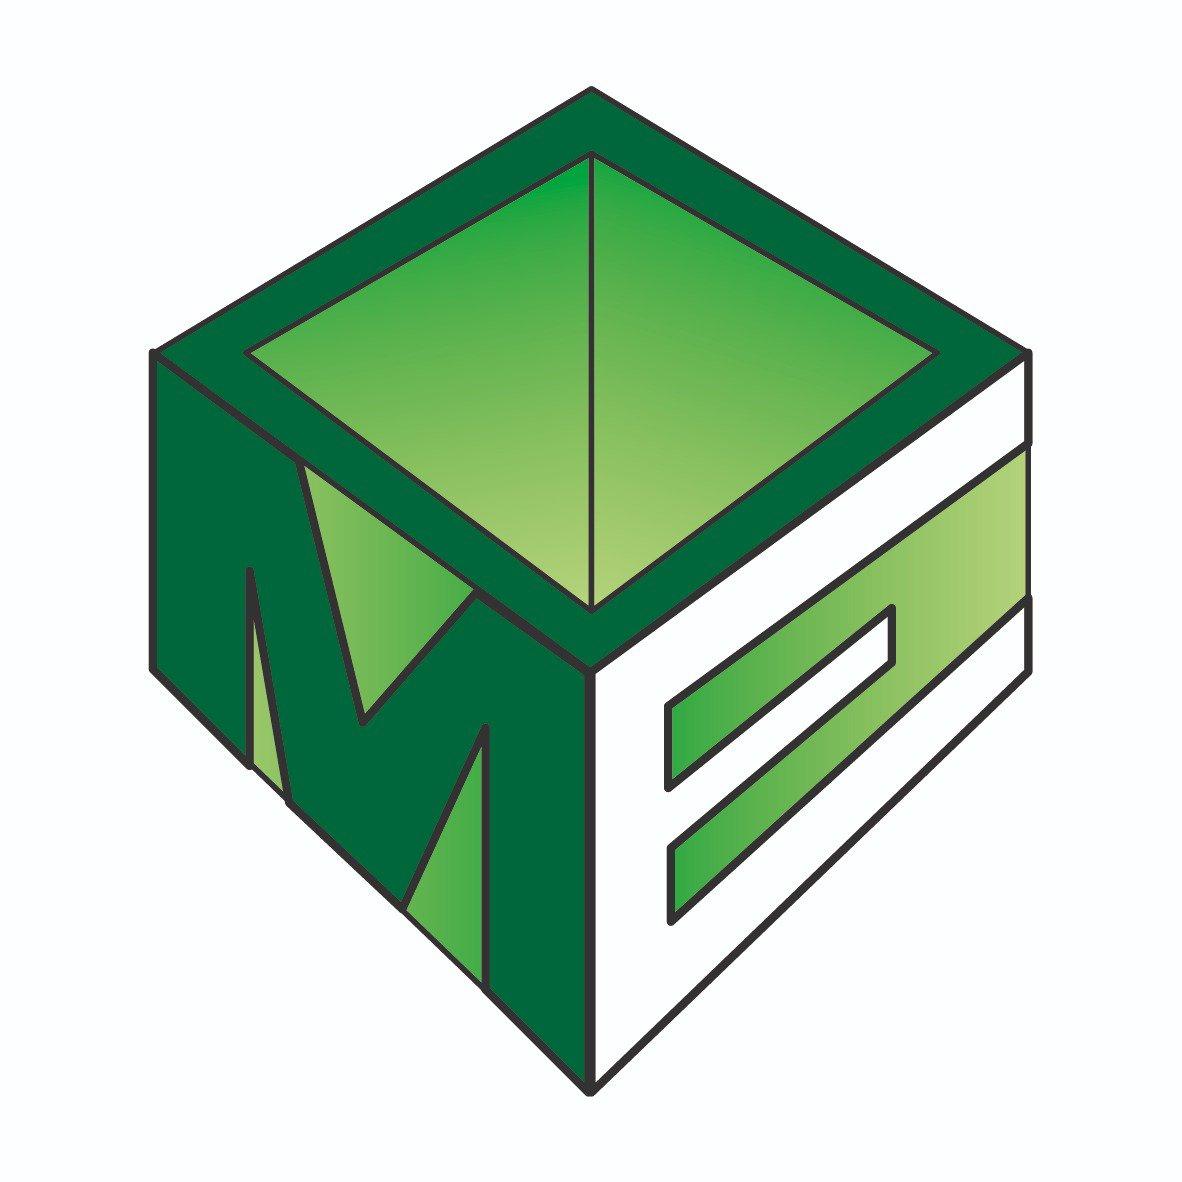 Maderas - Maderas Espinosa - Morelos